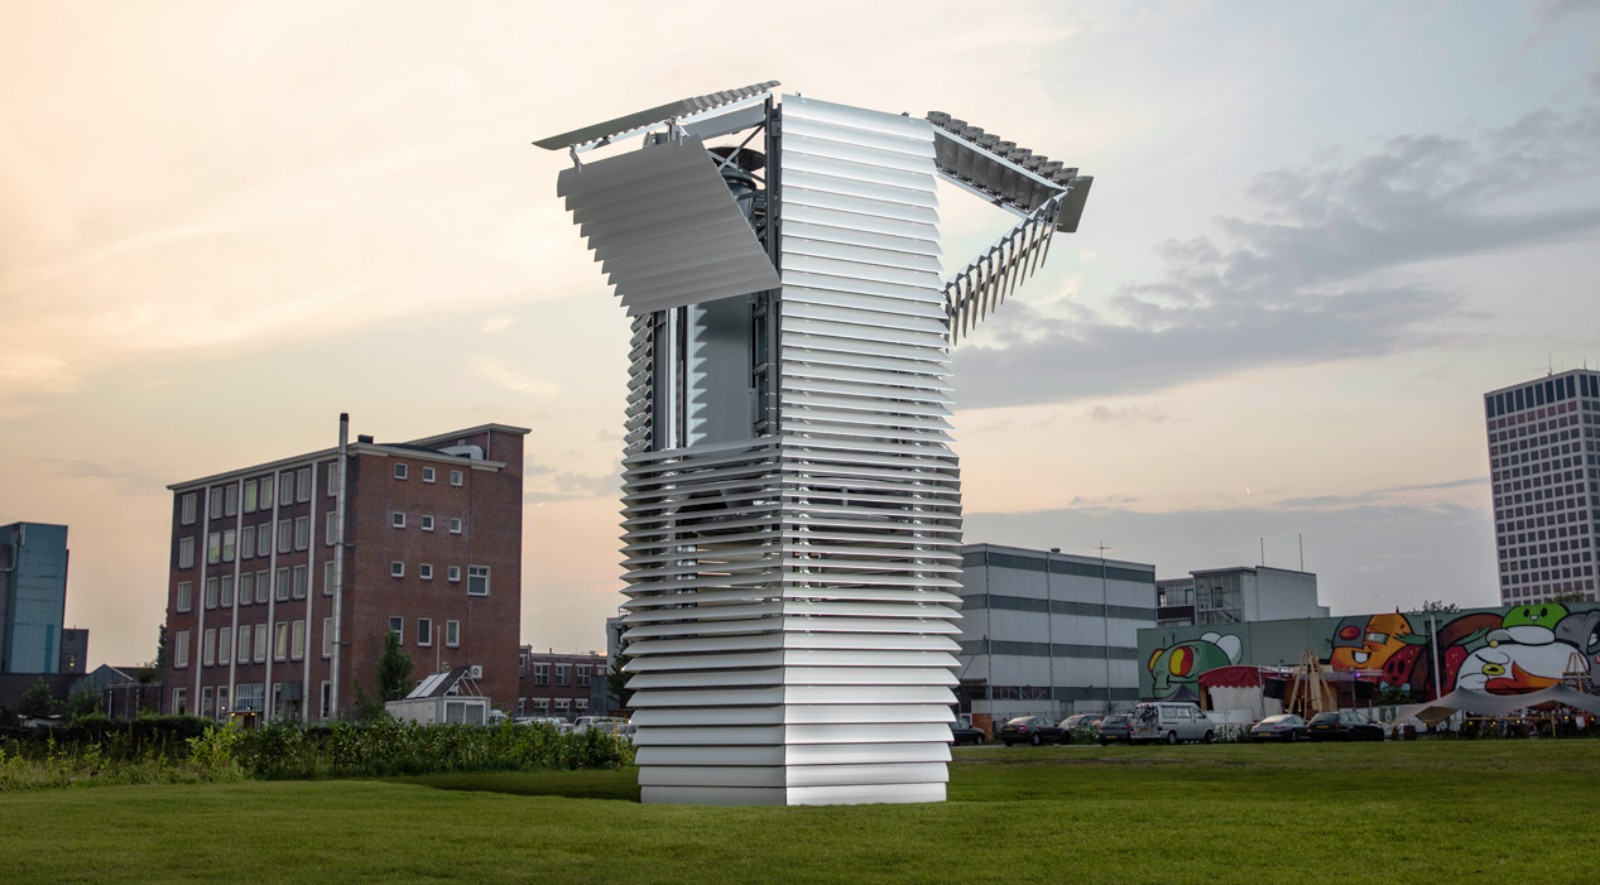 Smog-Free-Project-by-Studio-Roosegaarde-00jpg